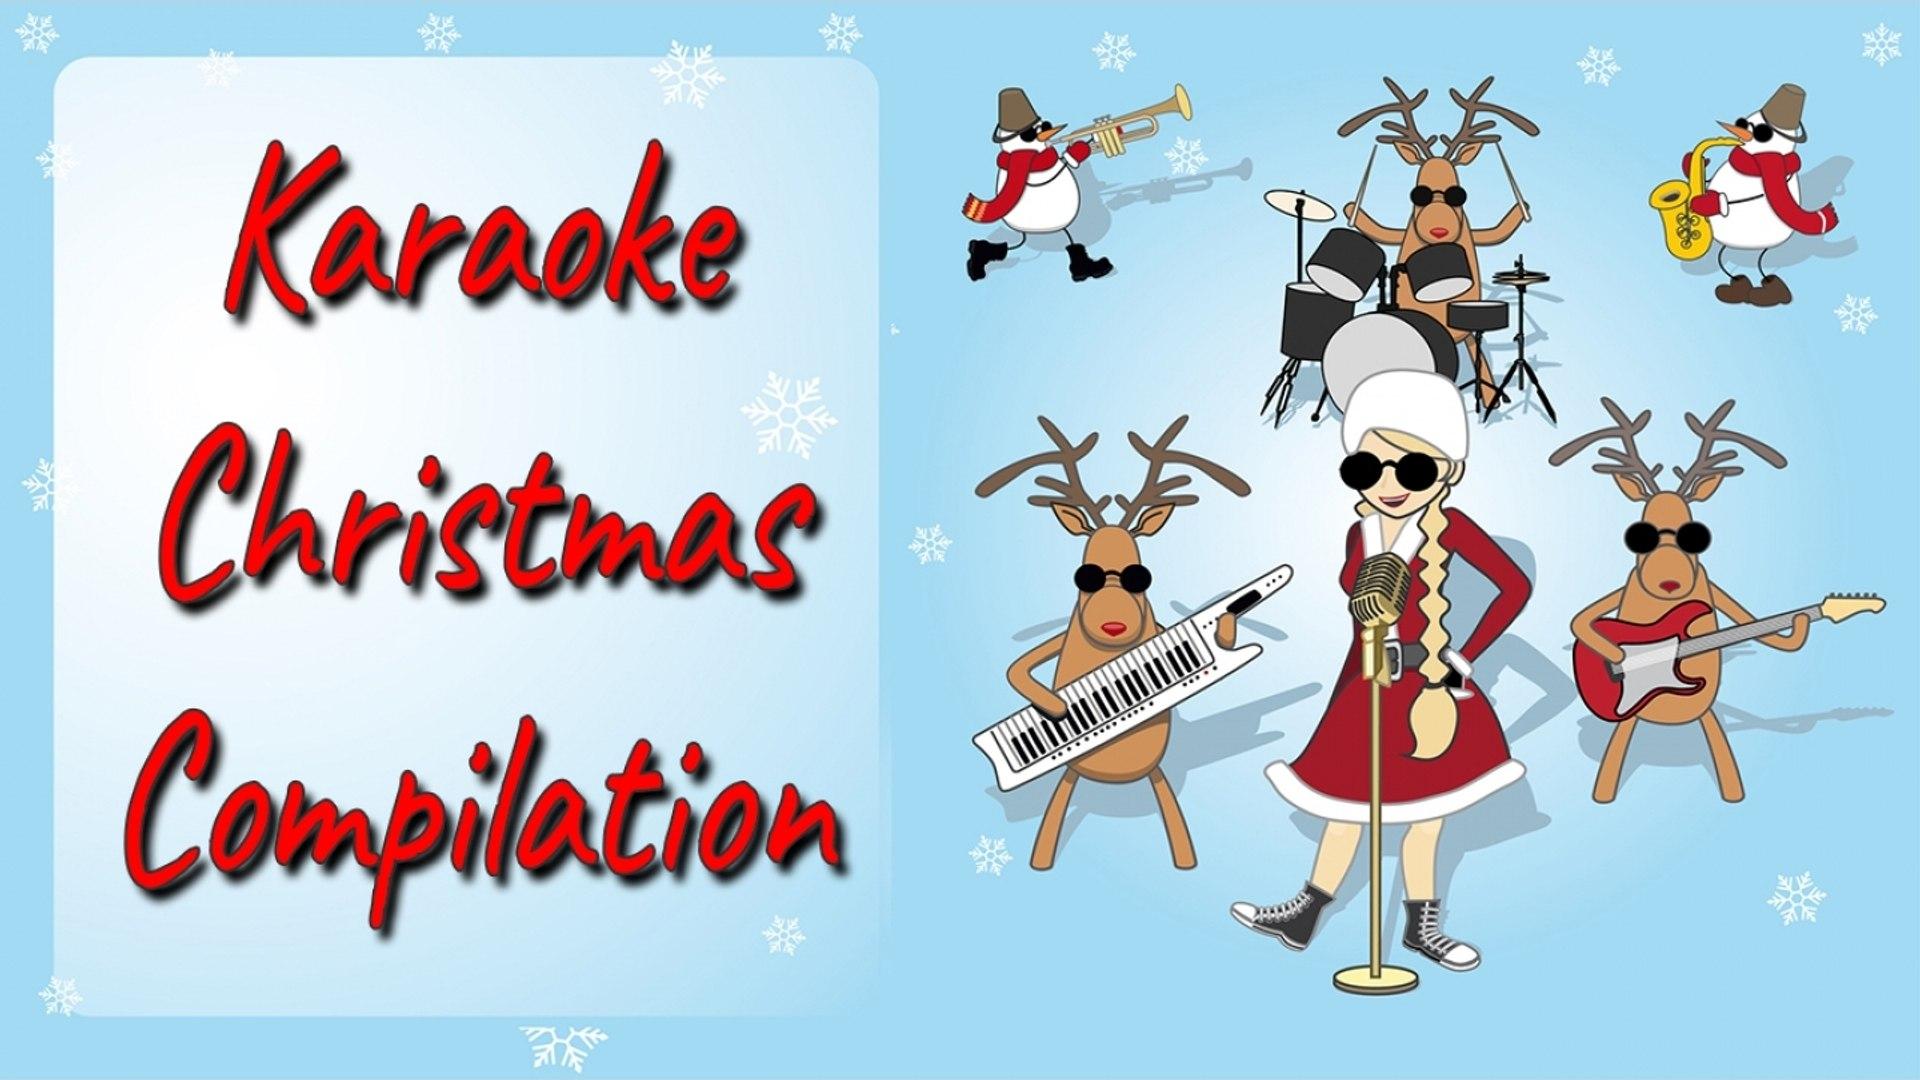 Auguri Di Buon Natale Karaoke.Sa Natale Karaoke Compilation Per Bambini Le Piu Famose Canzoni Inglese Di Natale Da Cantare